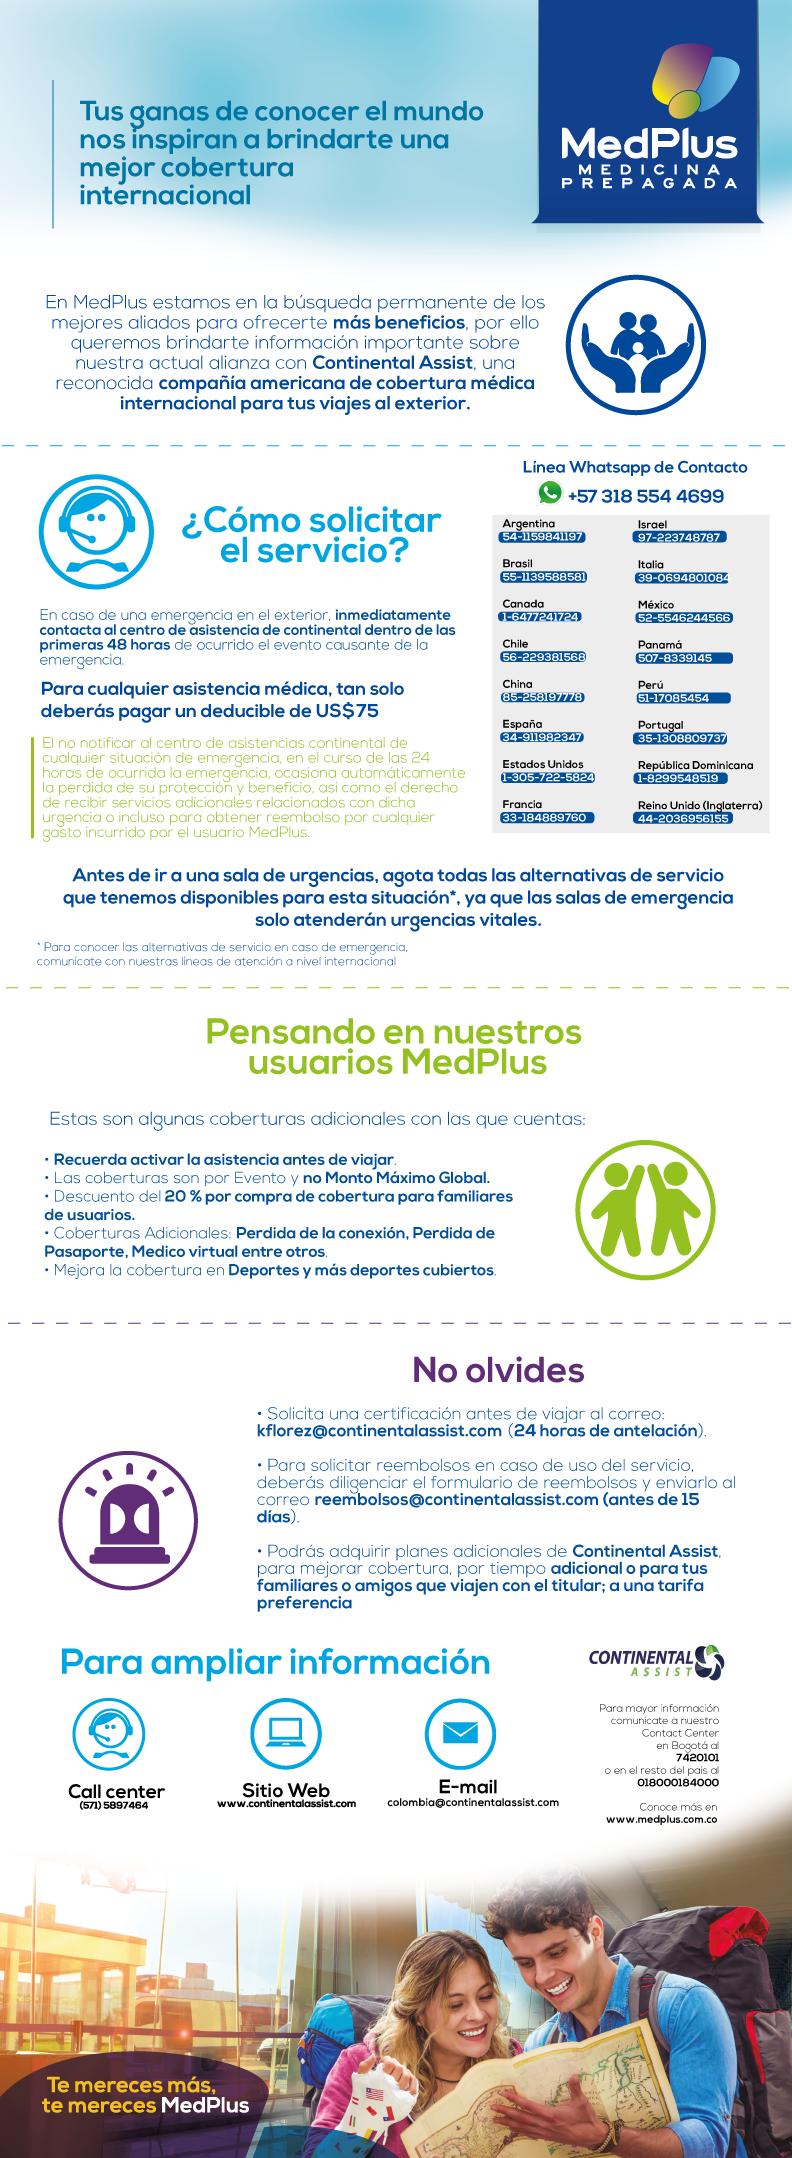 Asistencia médica internacional MedPlus - Continental Assist